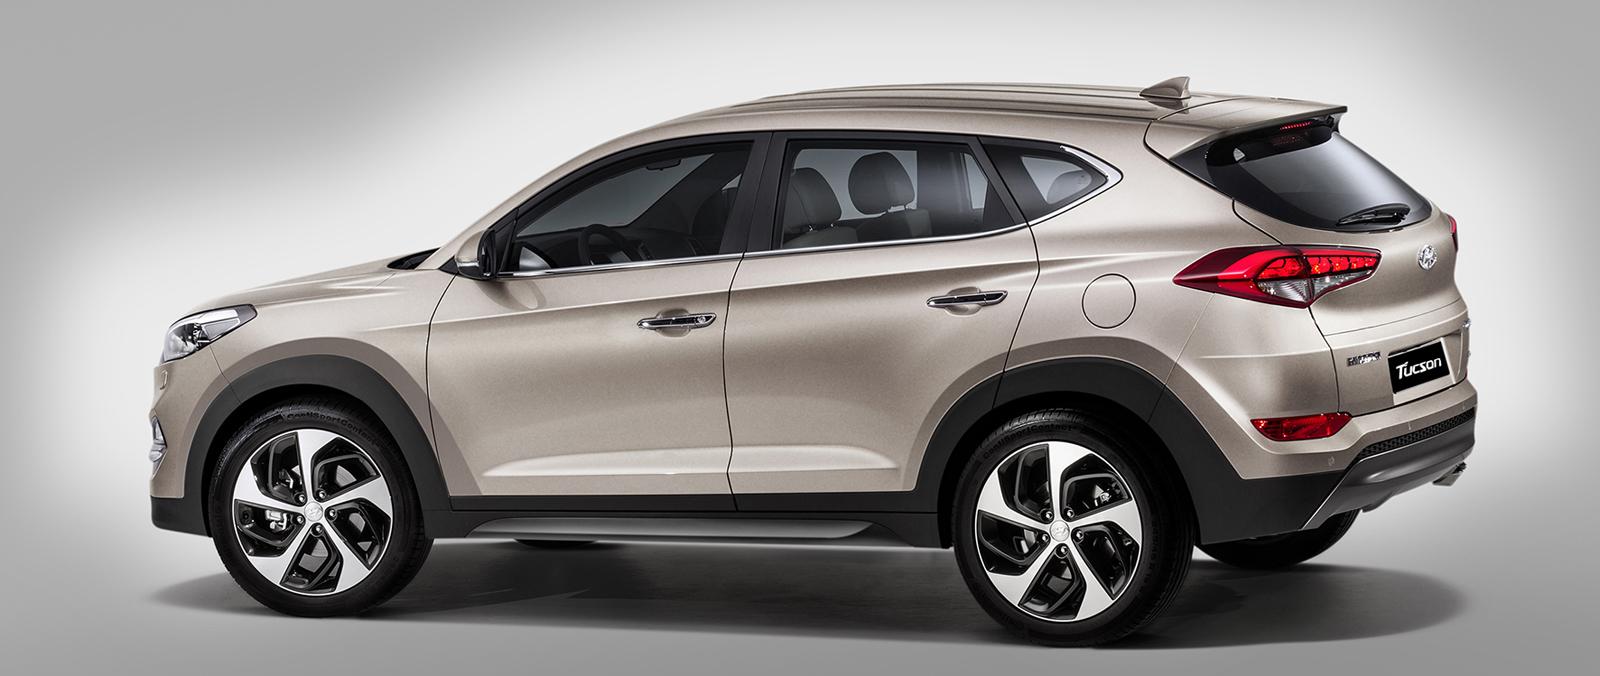 Geheel Nieuwe Hyundai Tucson In Geneve Hyundai